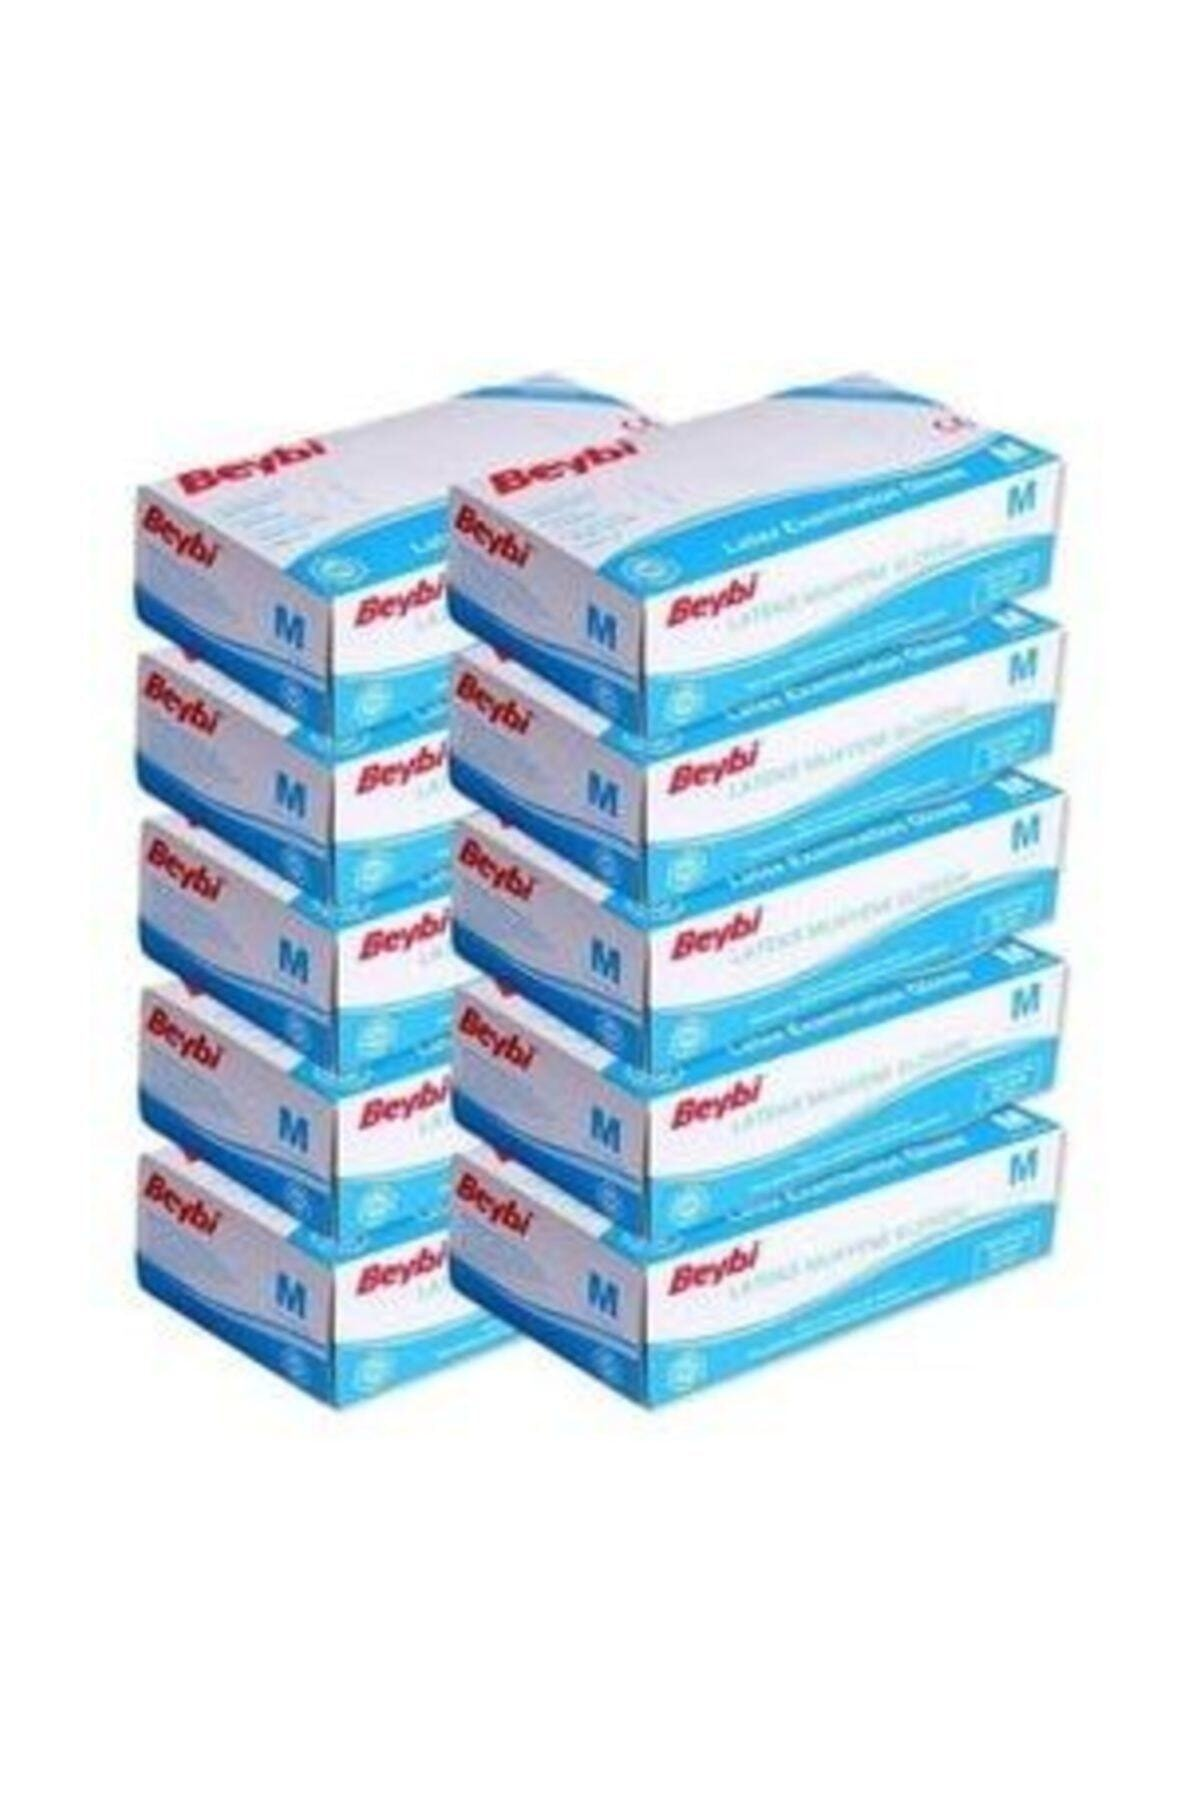 Latex Eldiven Pudralı M Beden 100'lü- 10 Paket